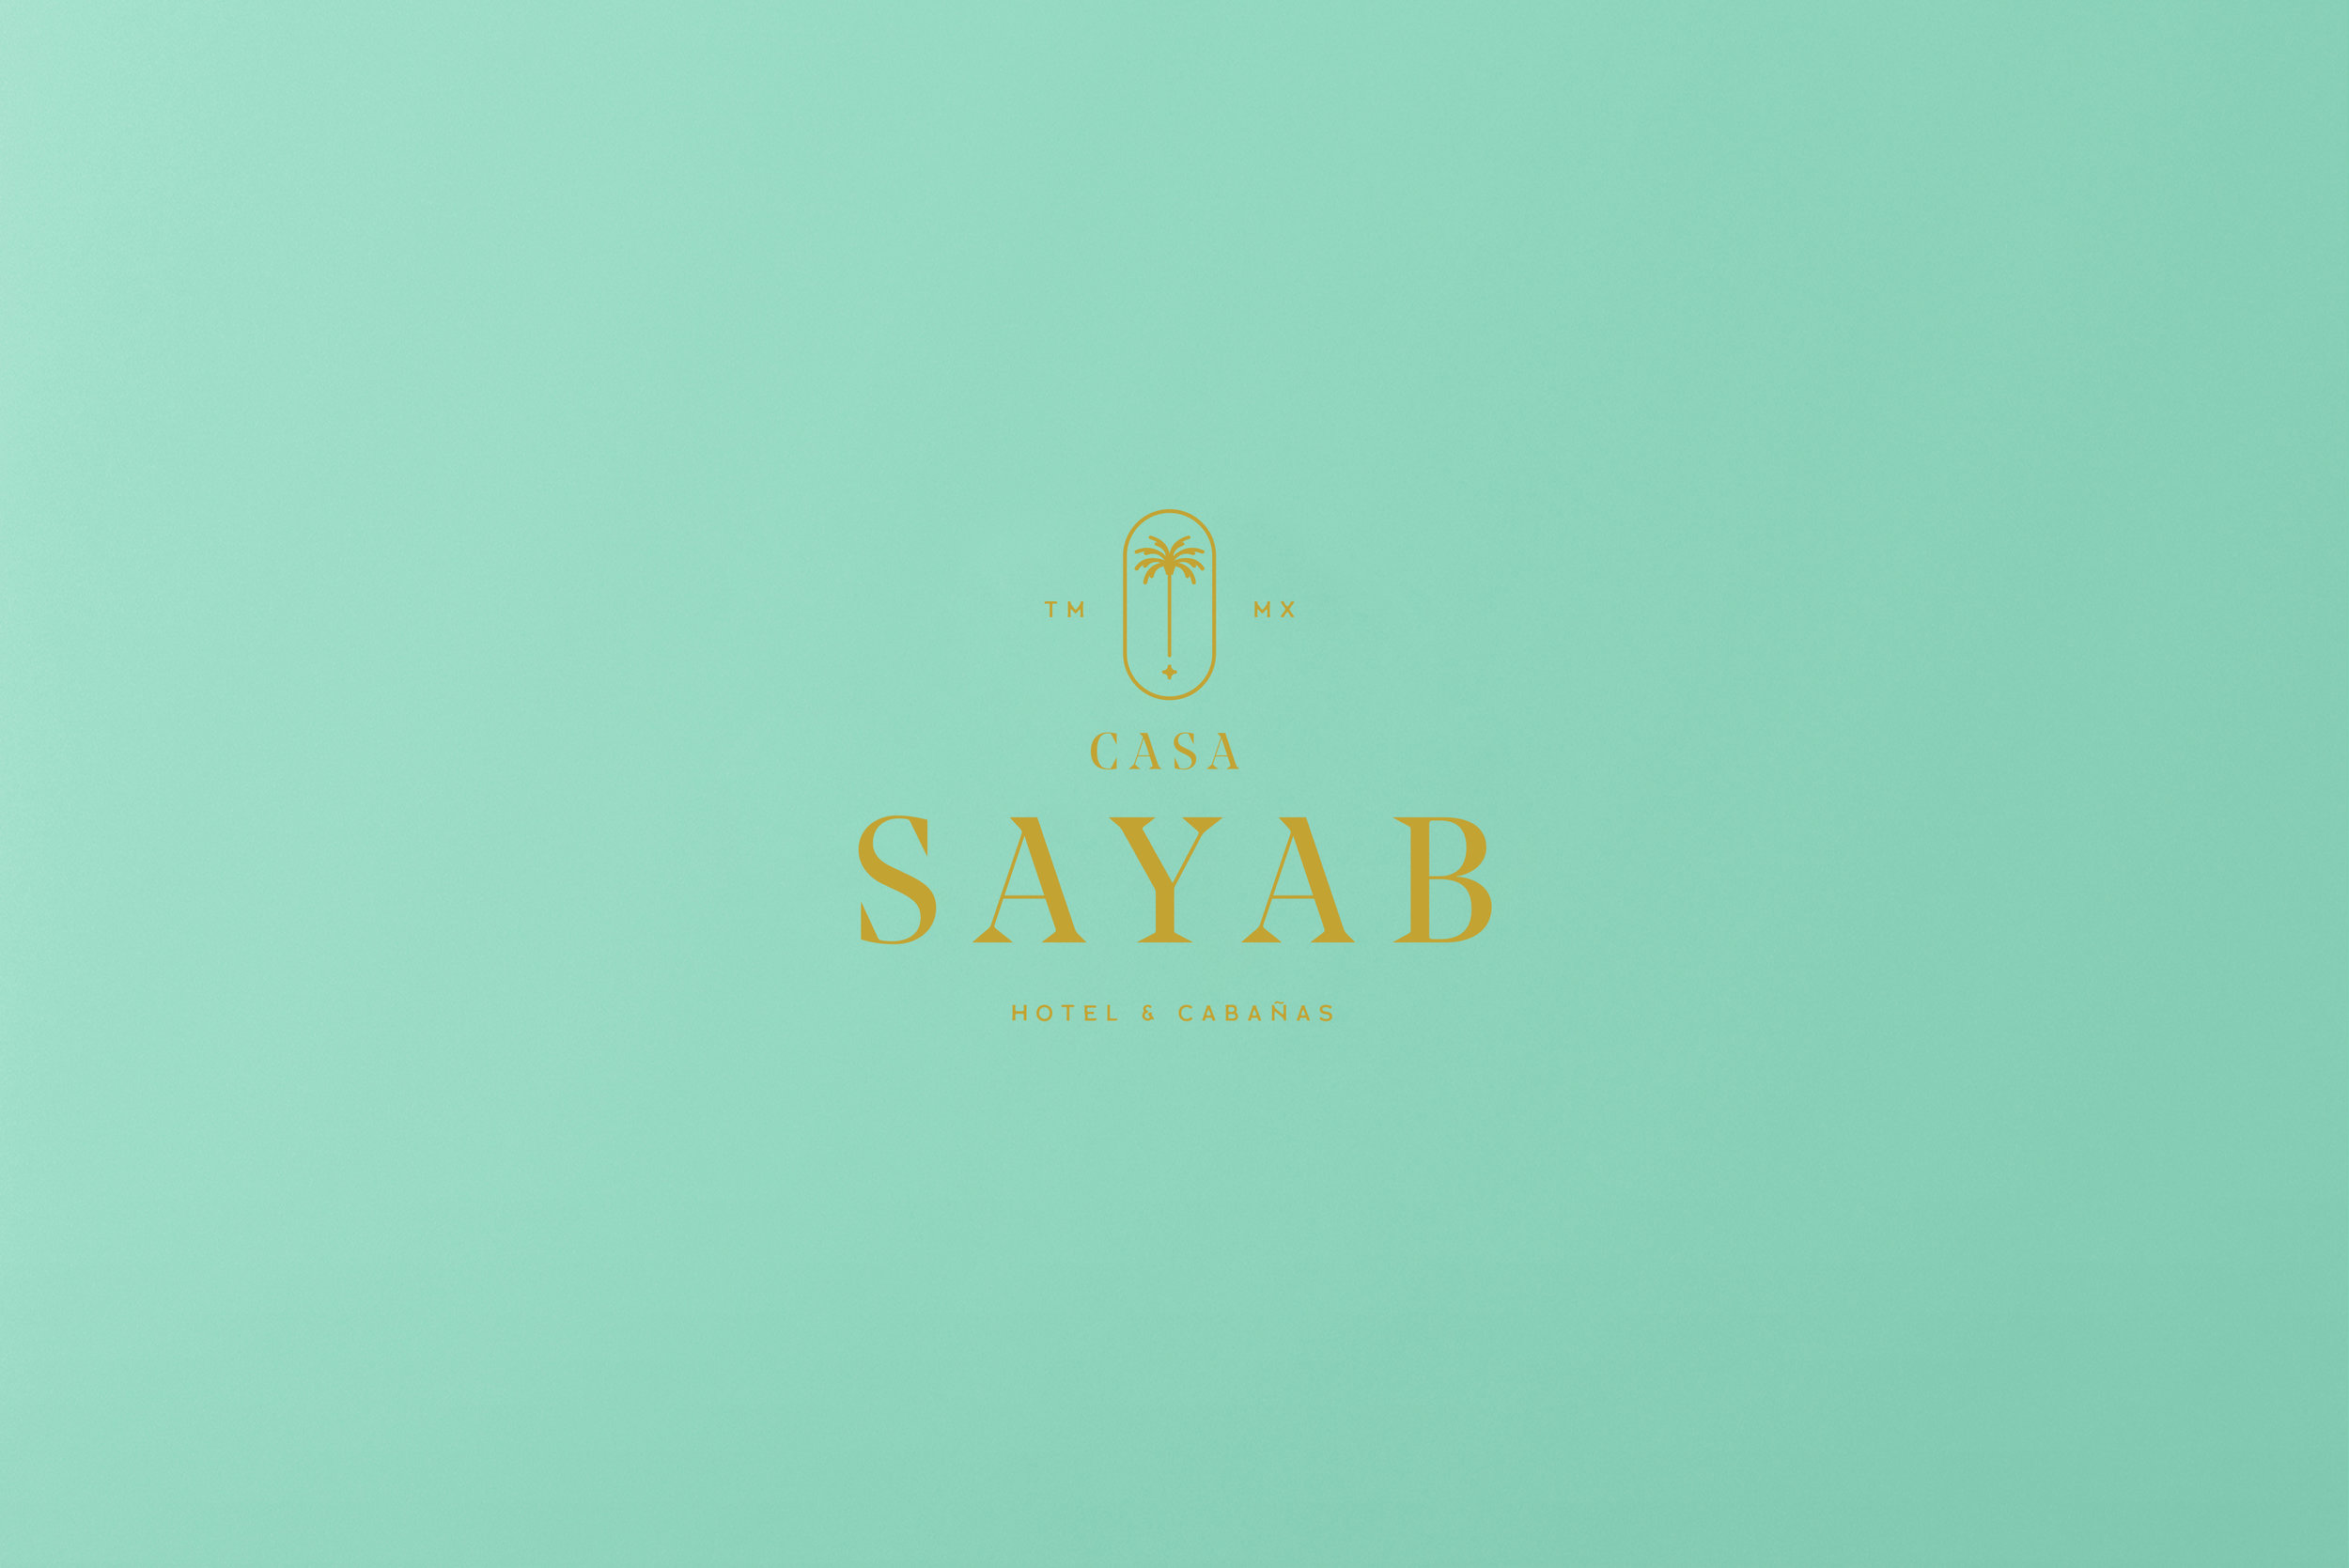 Casa_Sayab_escena_logo_2.jpg